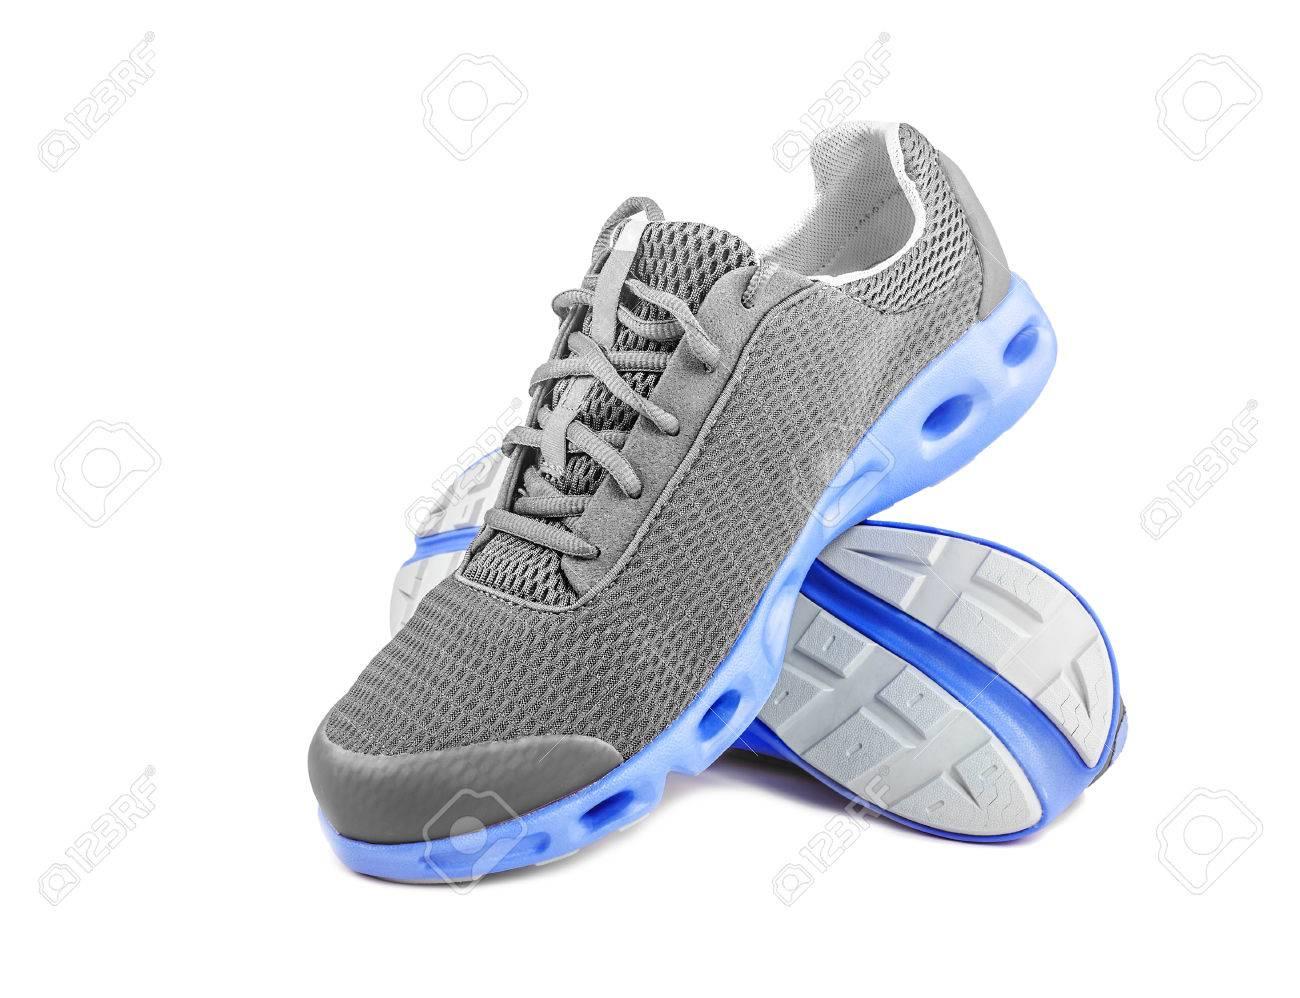 aa1d2e0435330 zapatillas de deporte sin marca